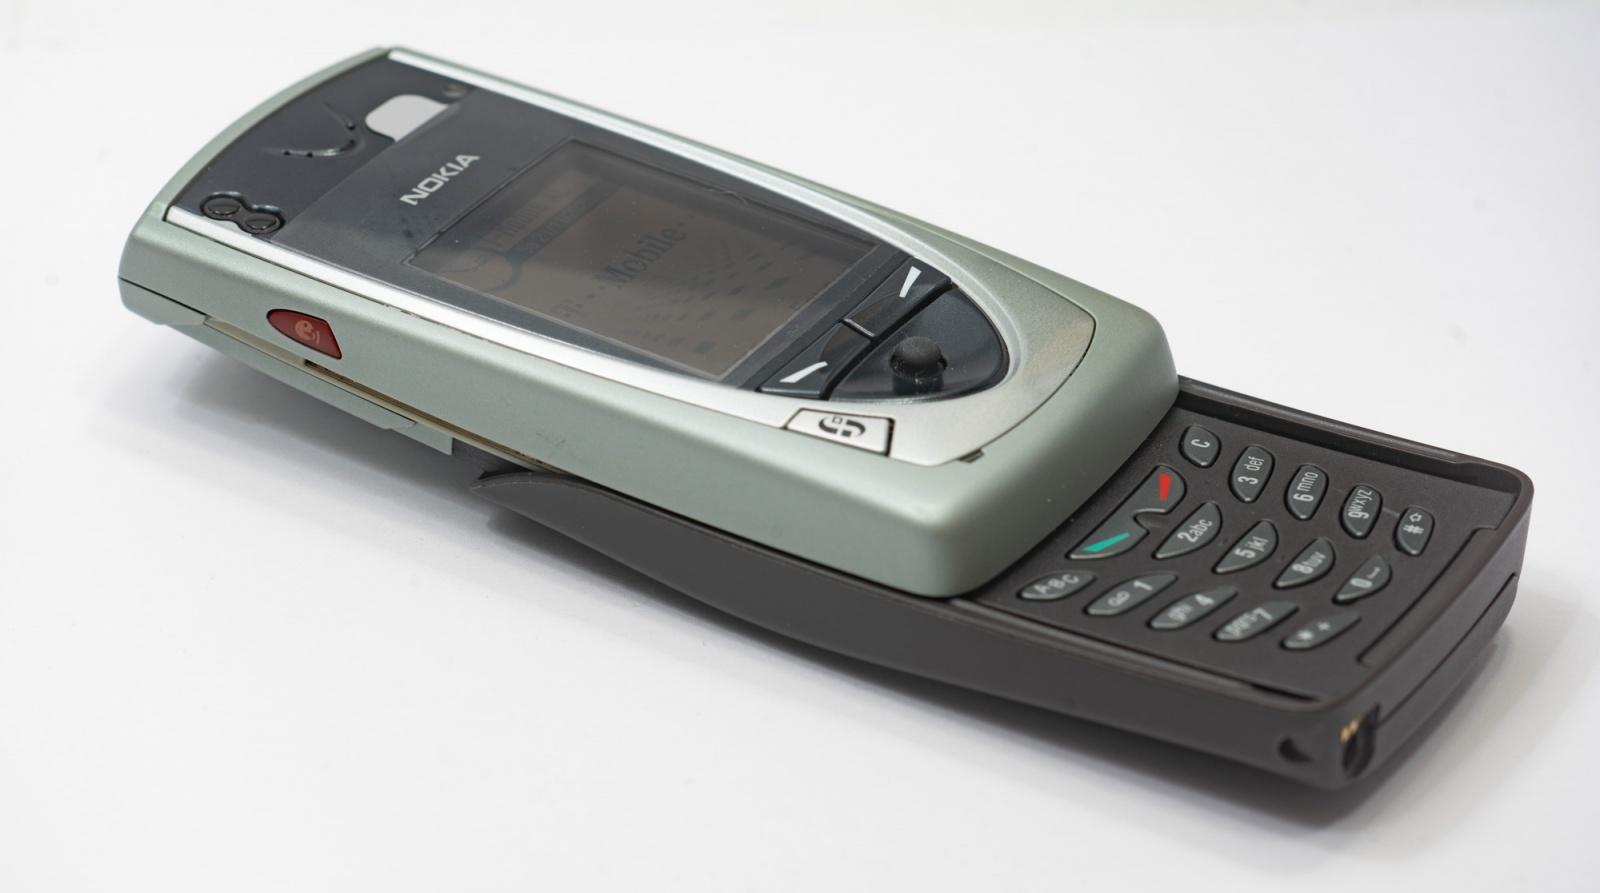 Nokia 7650 и начало эпохи смартфонов - 1